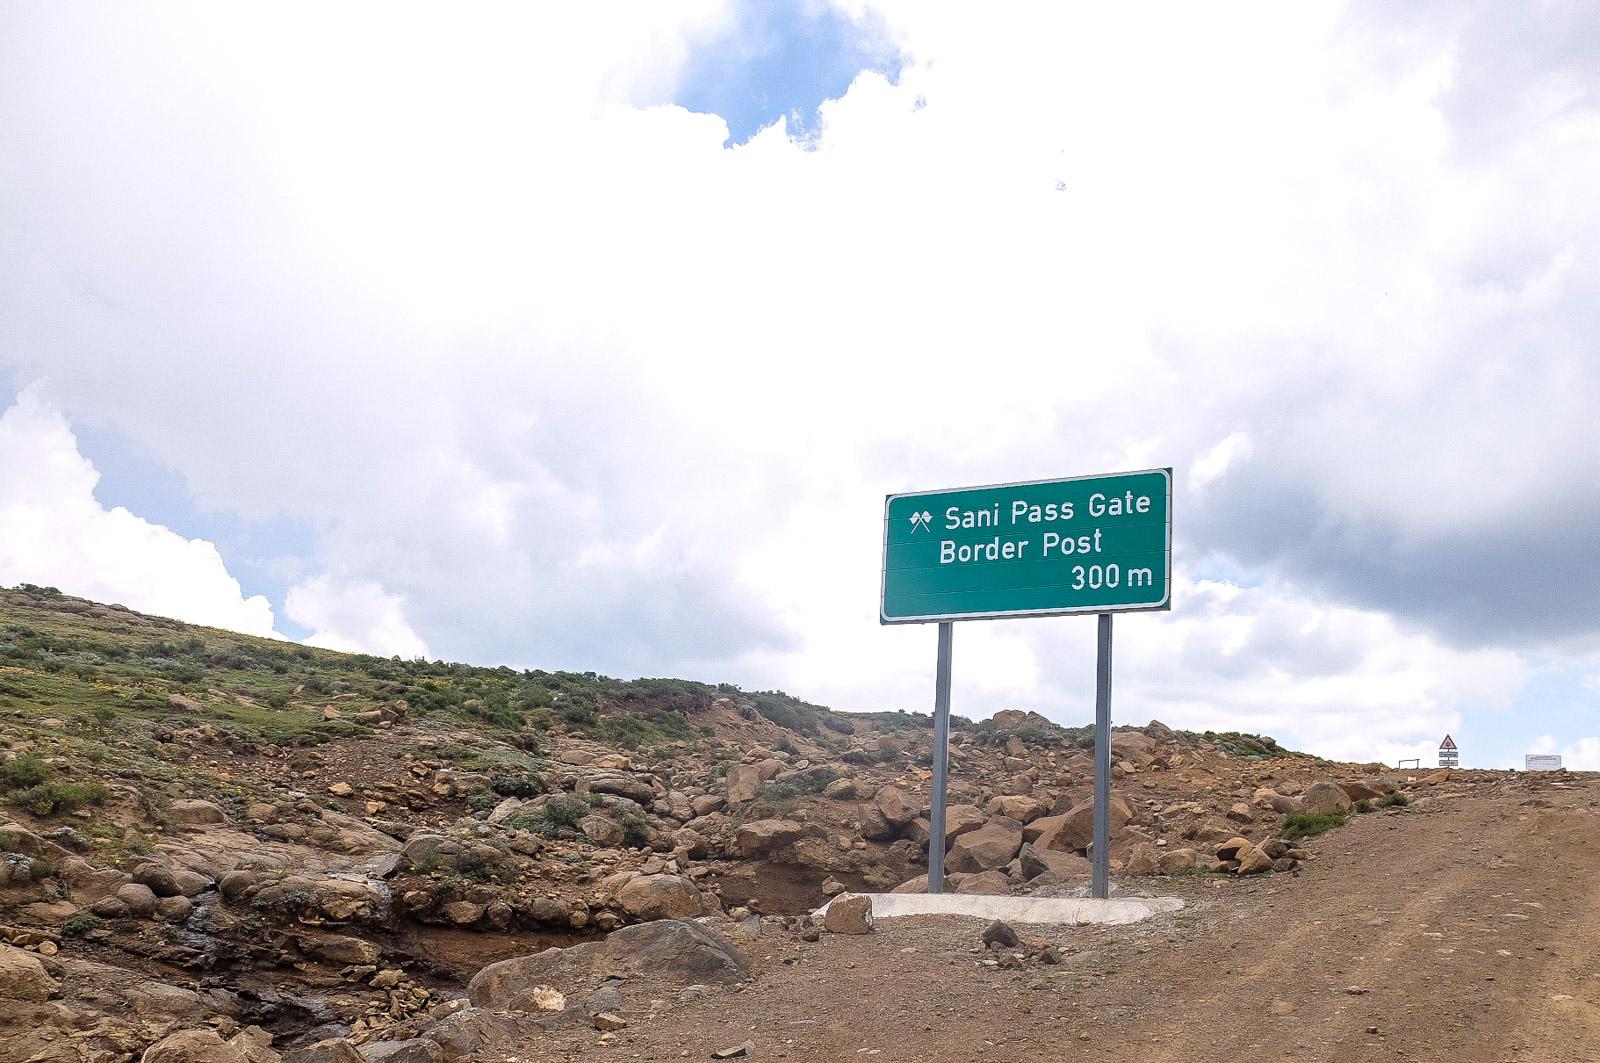 Sani Pass Boarder